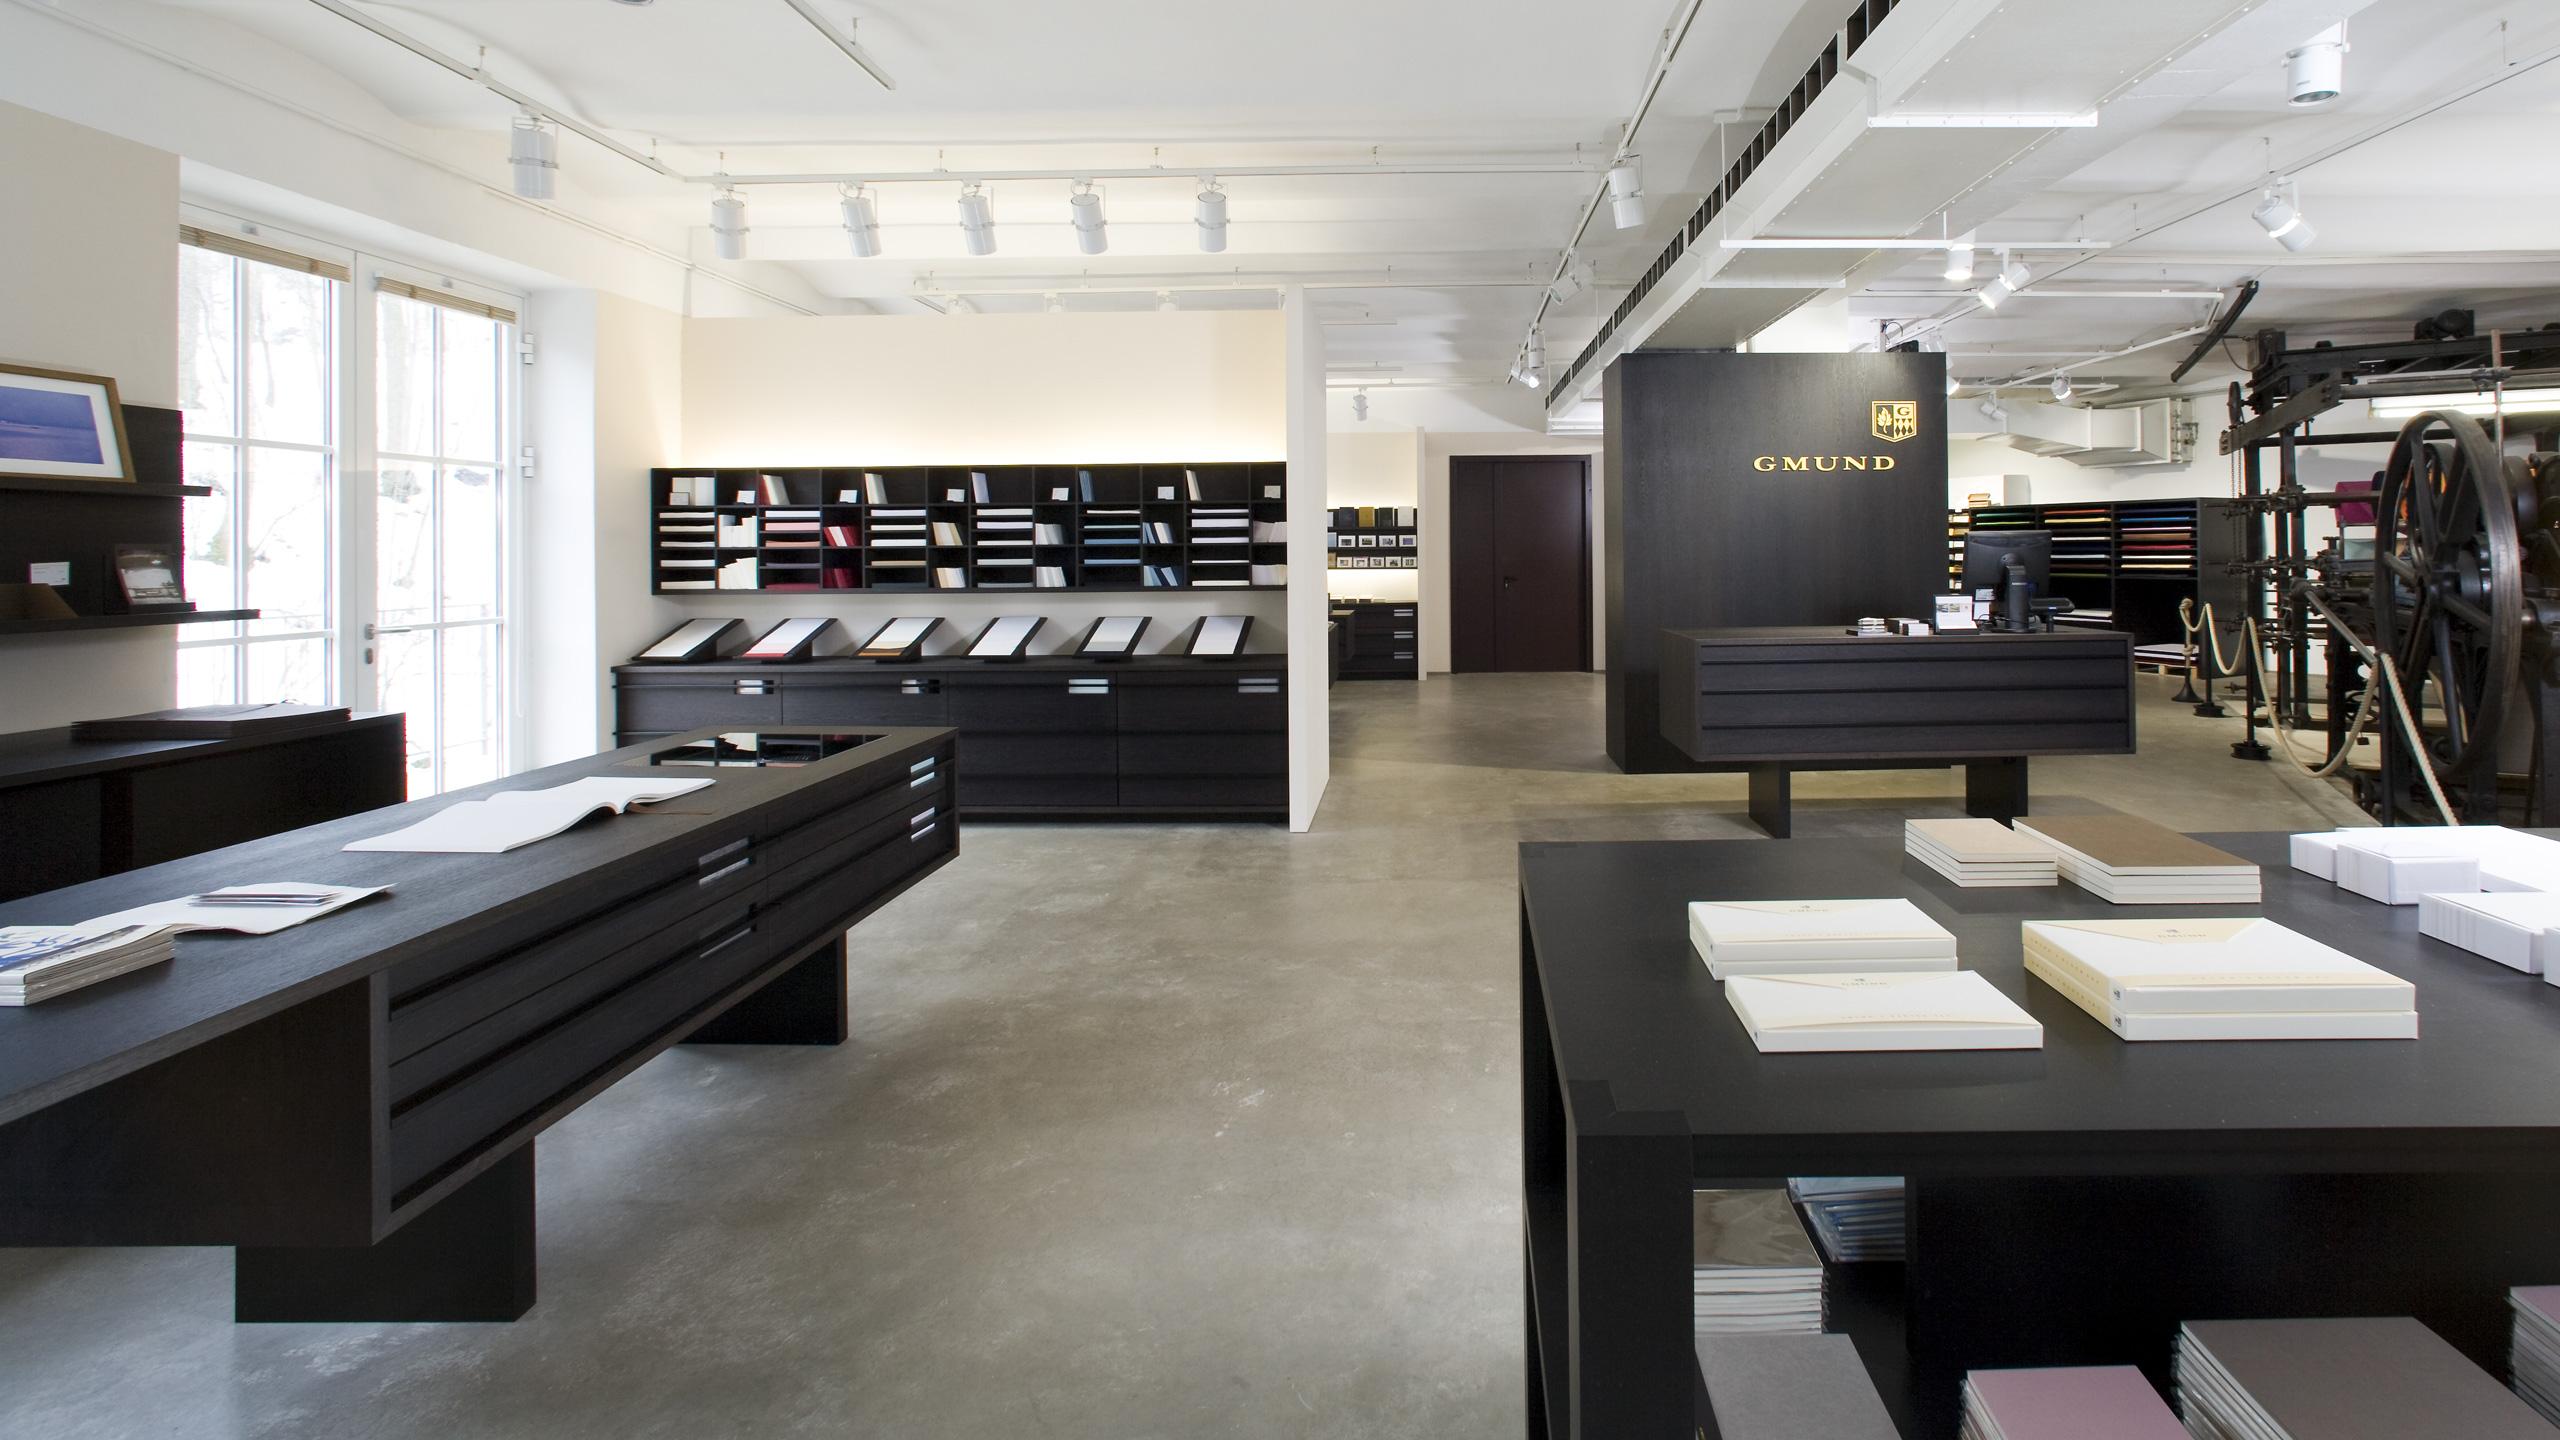 gmund-interactive-photograph-store